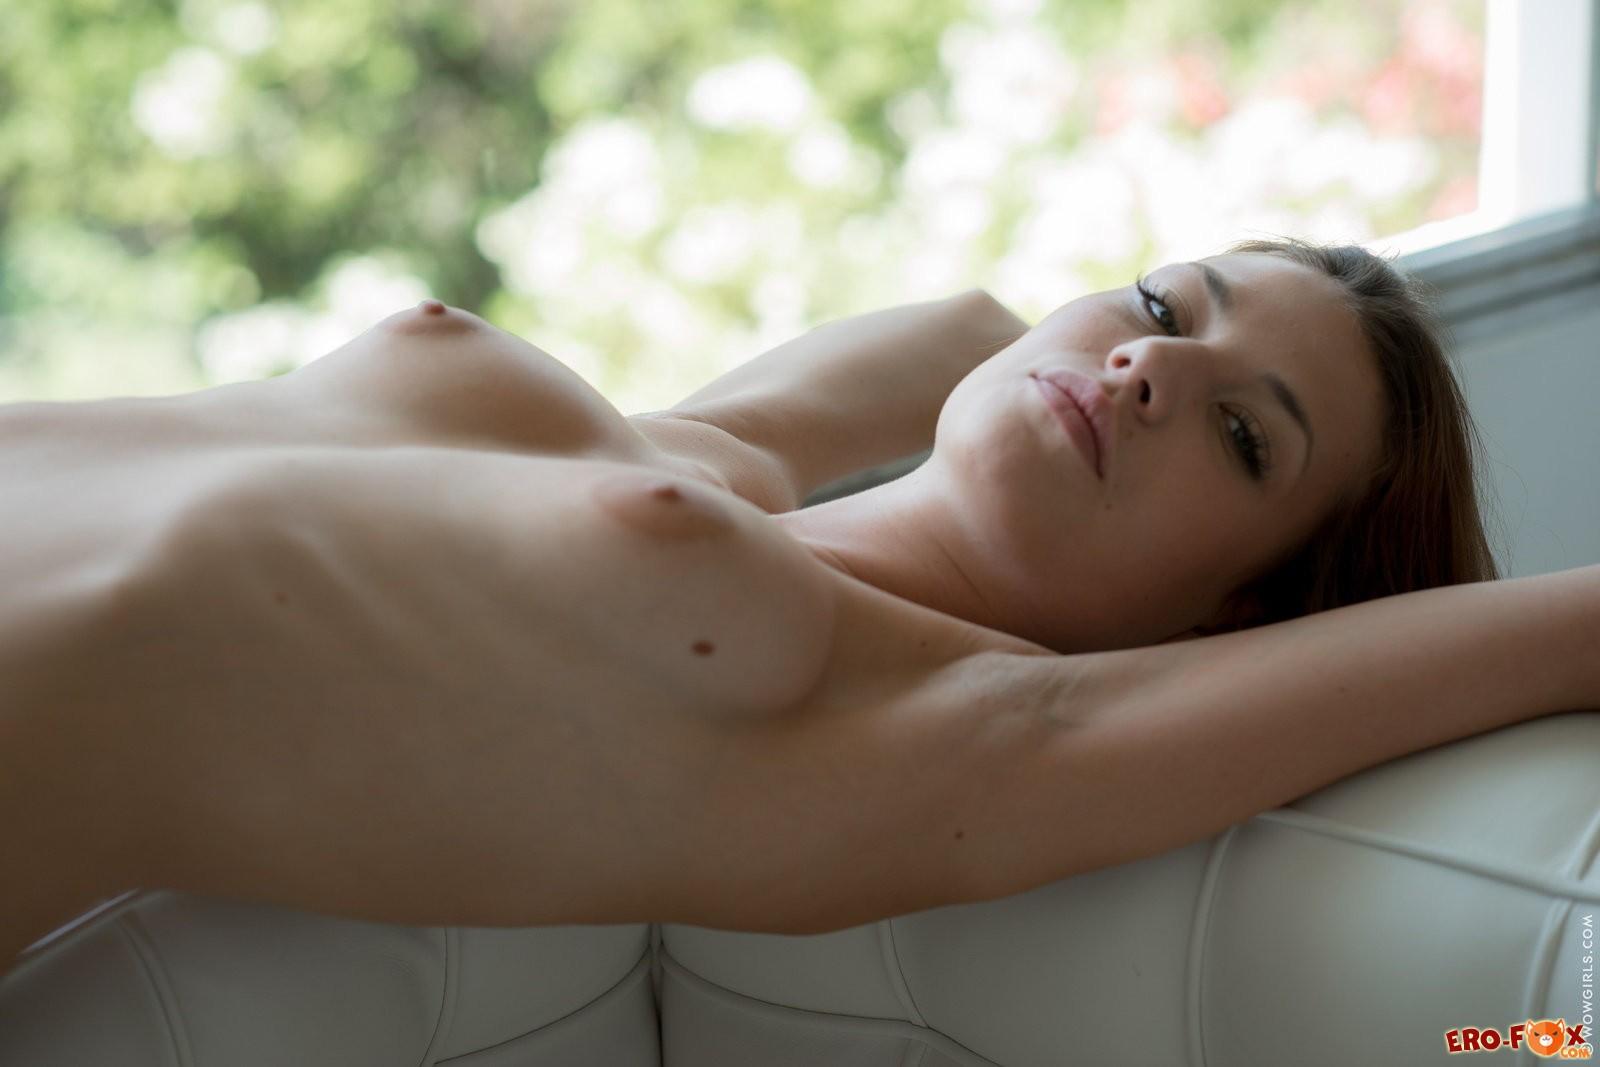 Худая голая попа девушки .